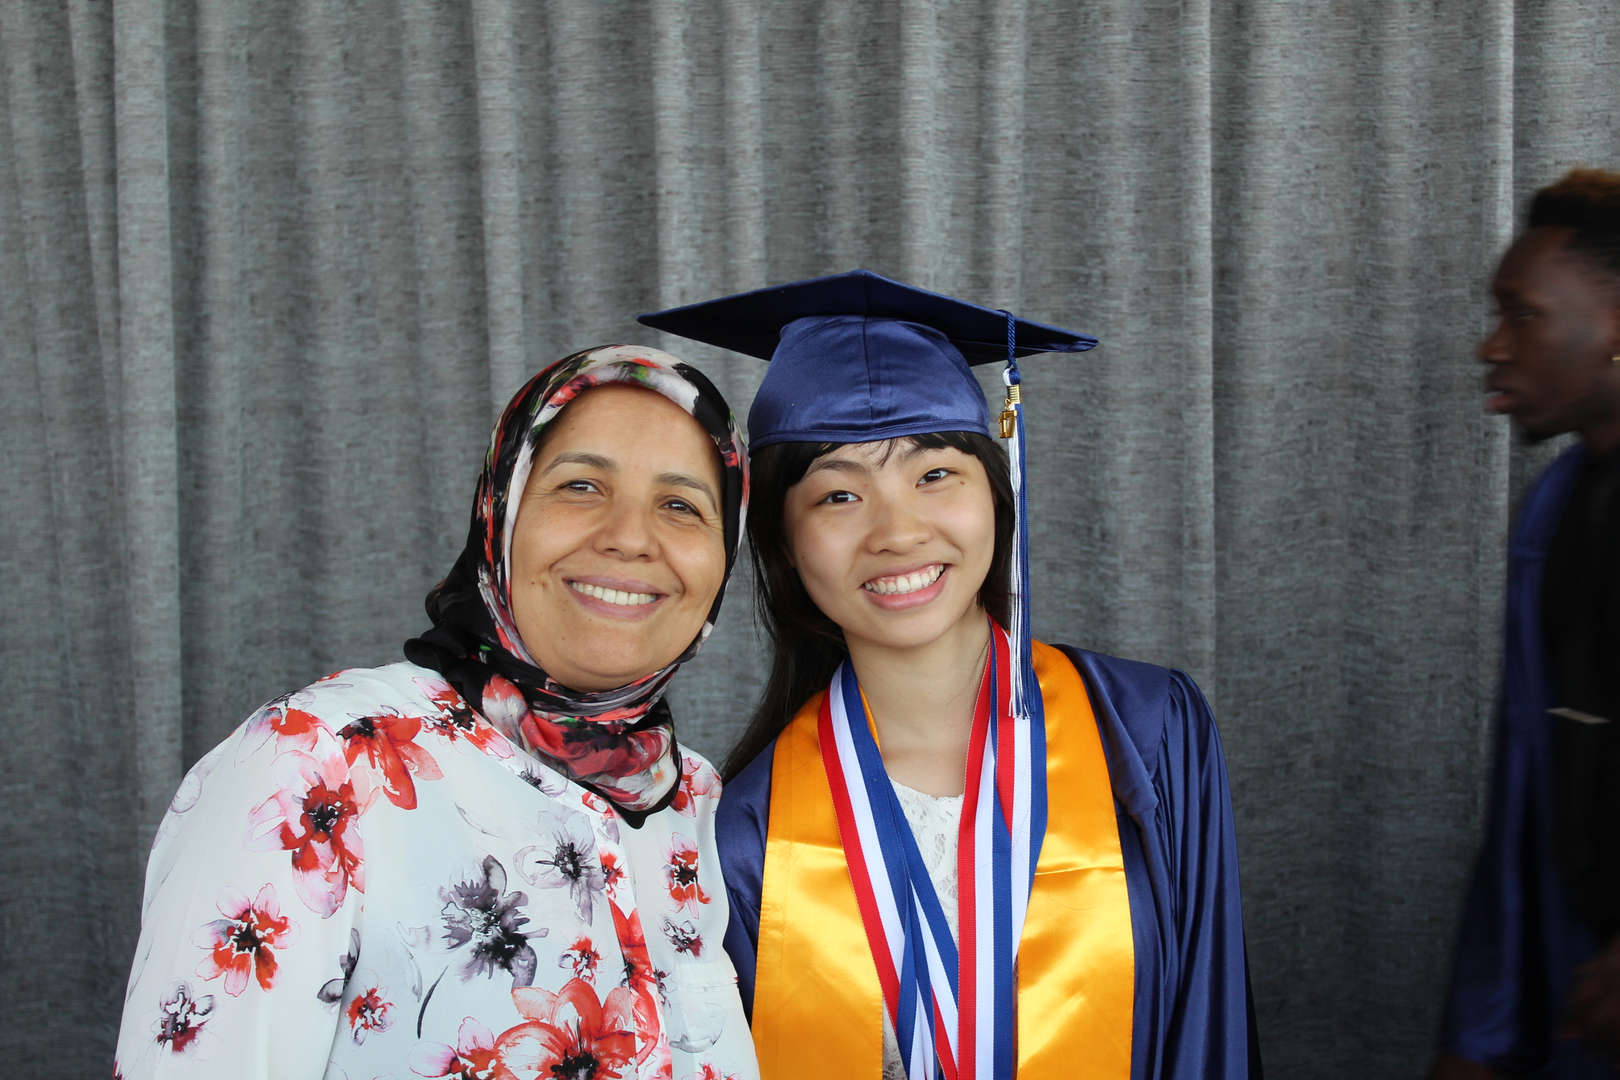 Ms. Taiae and Graduate